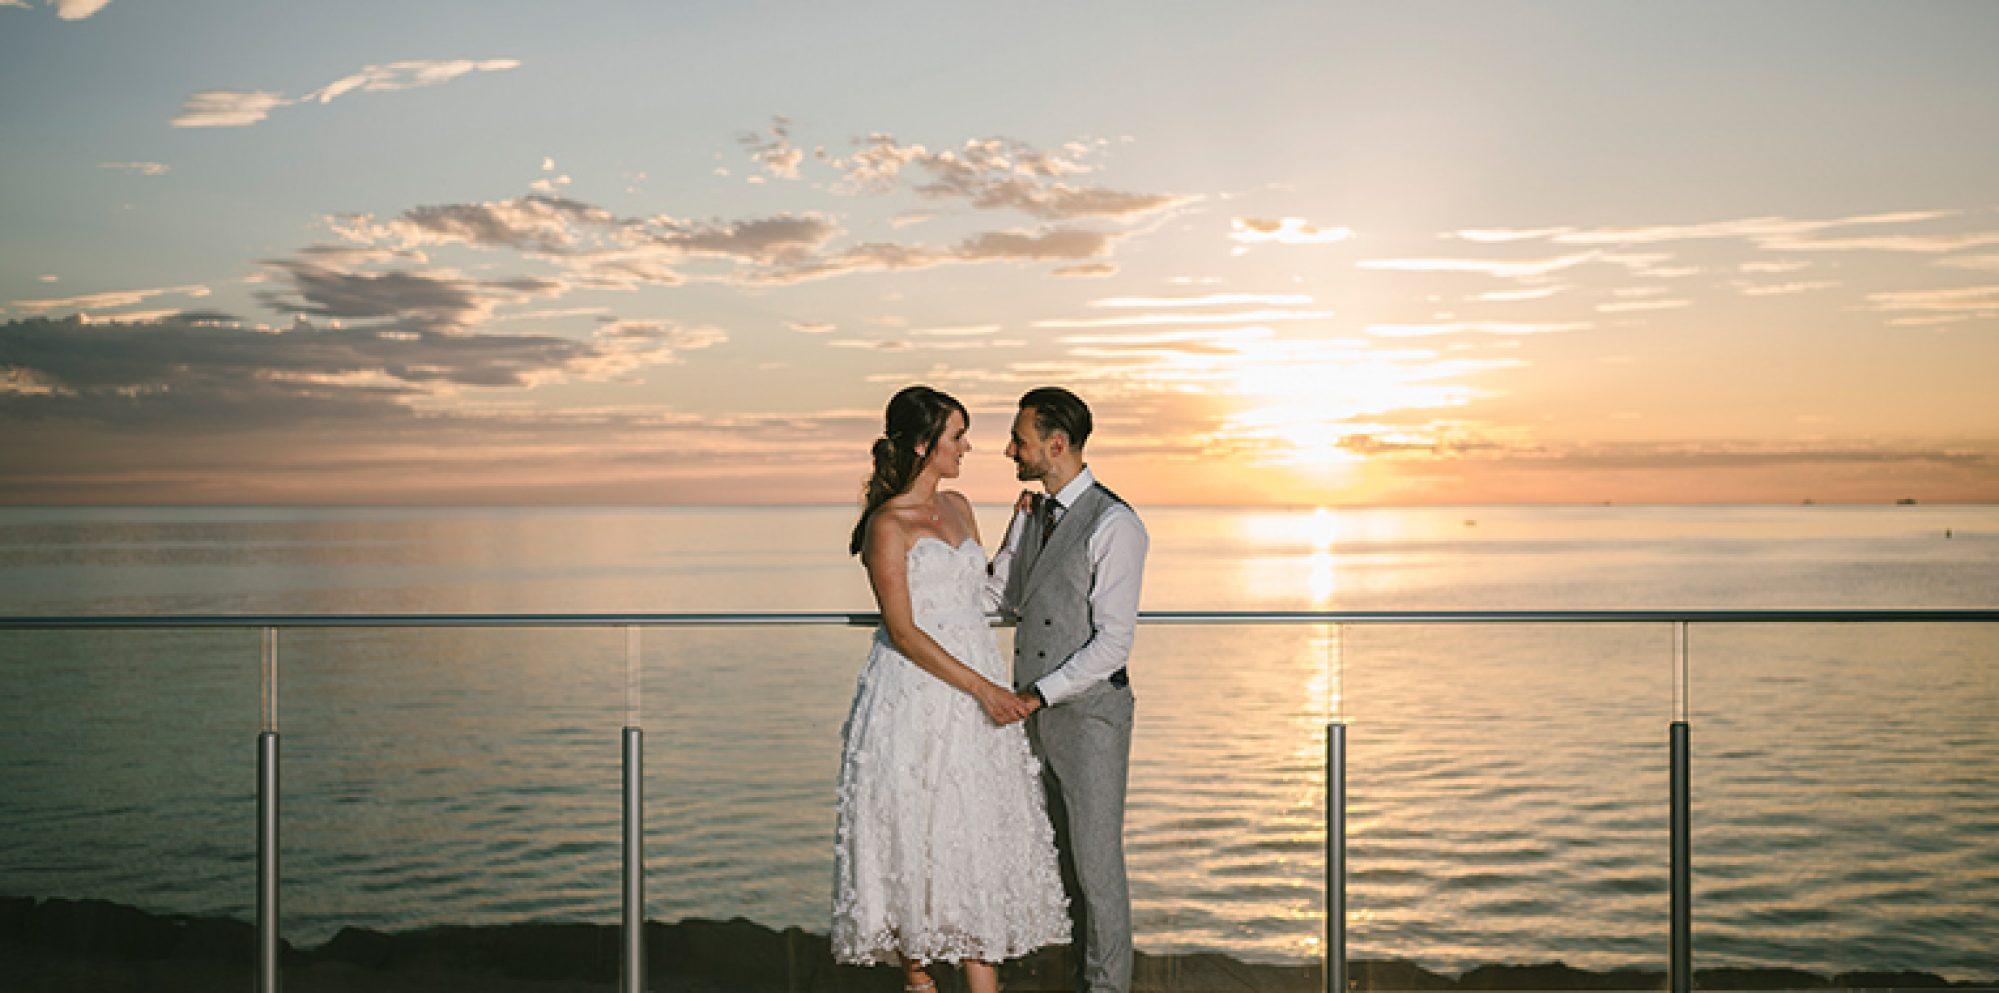 Rania & louis wedding videography @ sandringham yacht club